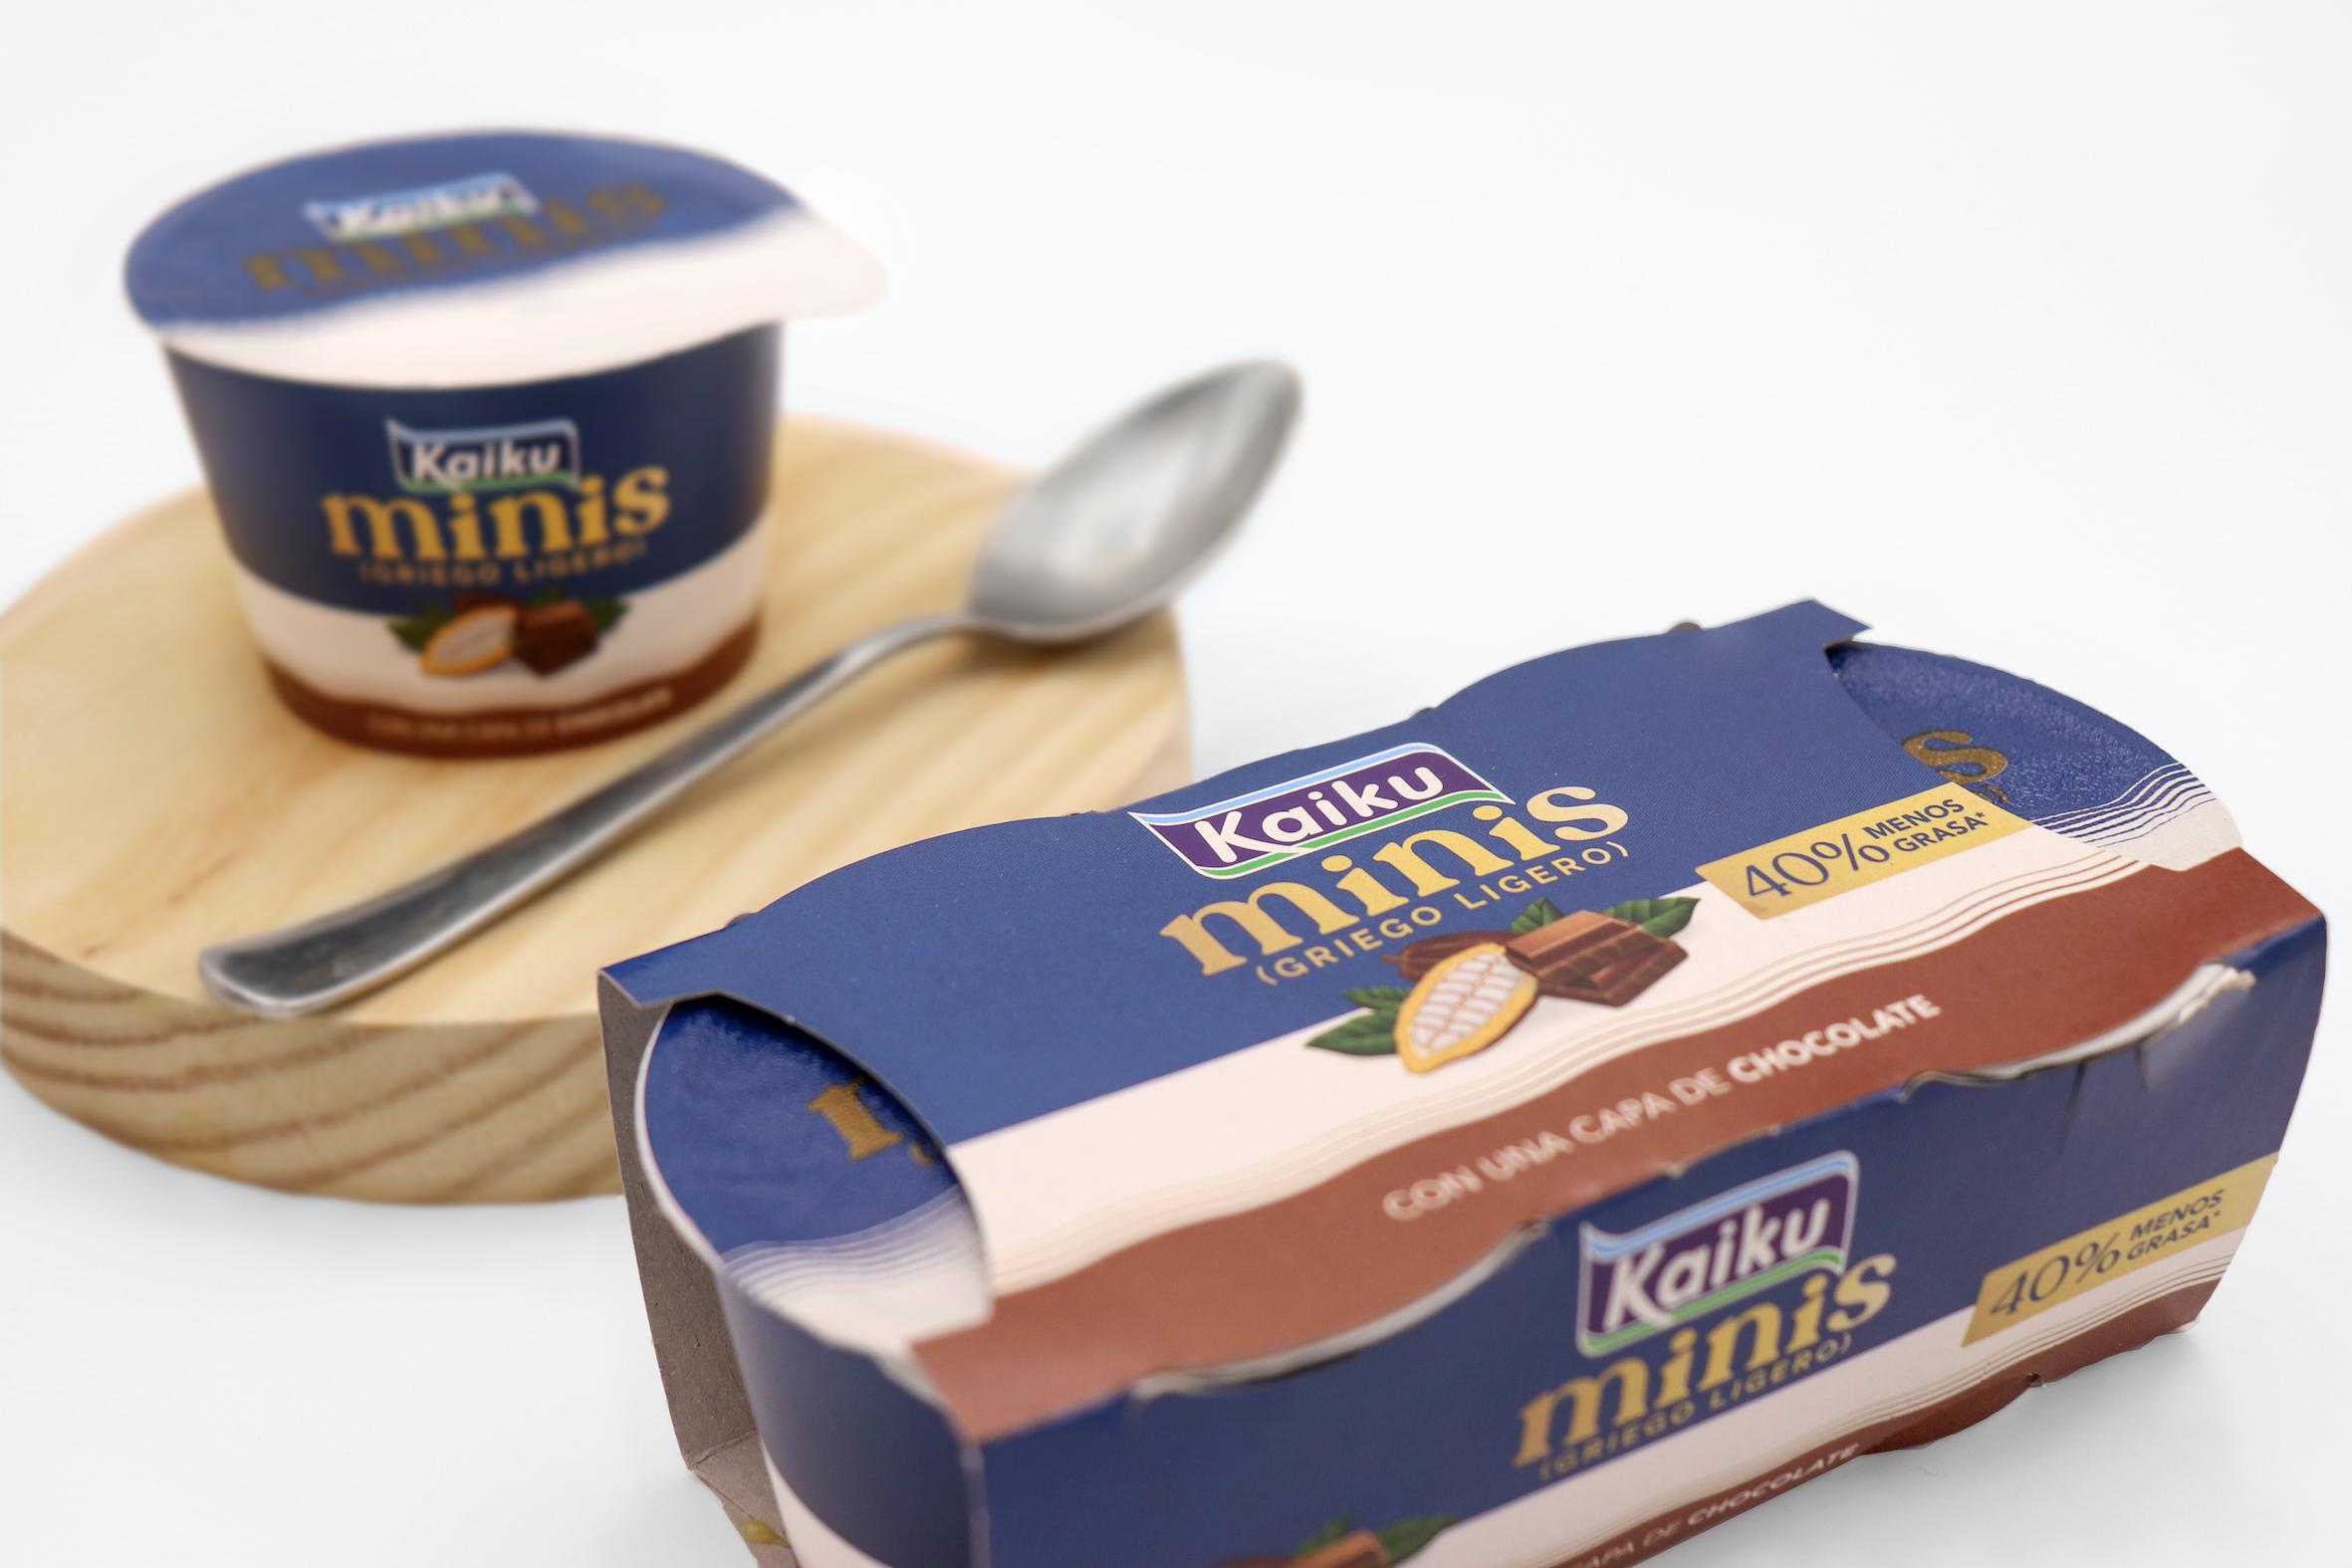 TSMGO Design Brand and Packaging for Kaiku Minis